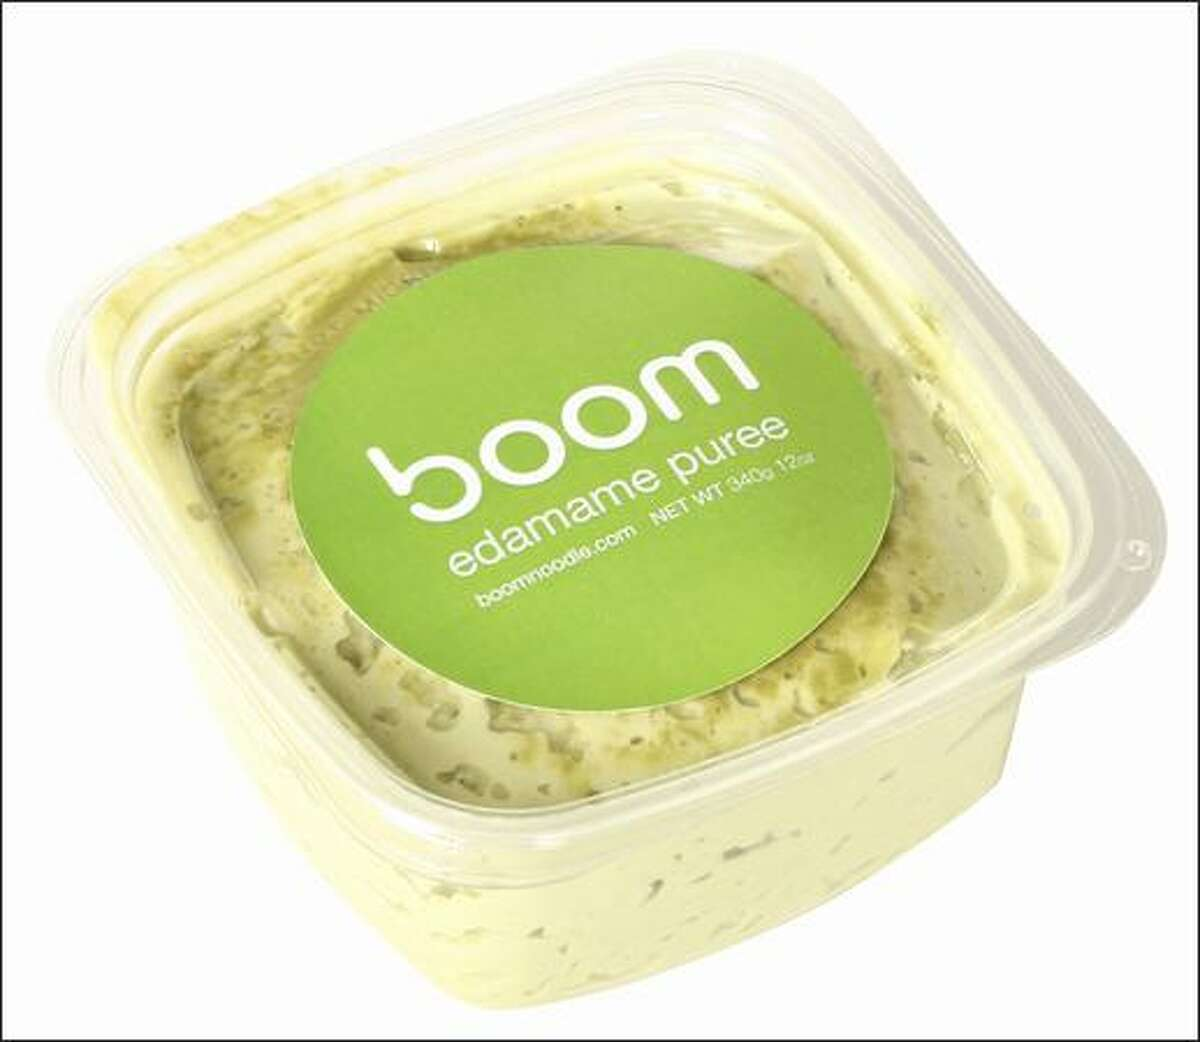 Boom Noodle's Edamame Puree